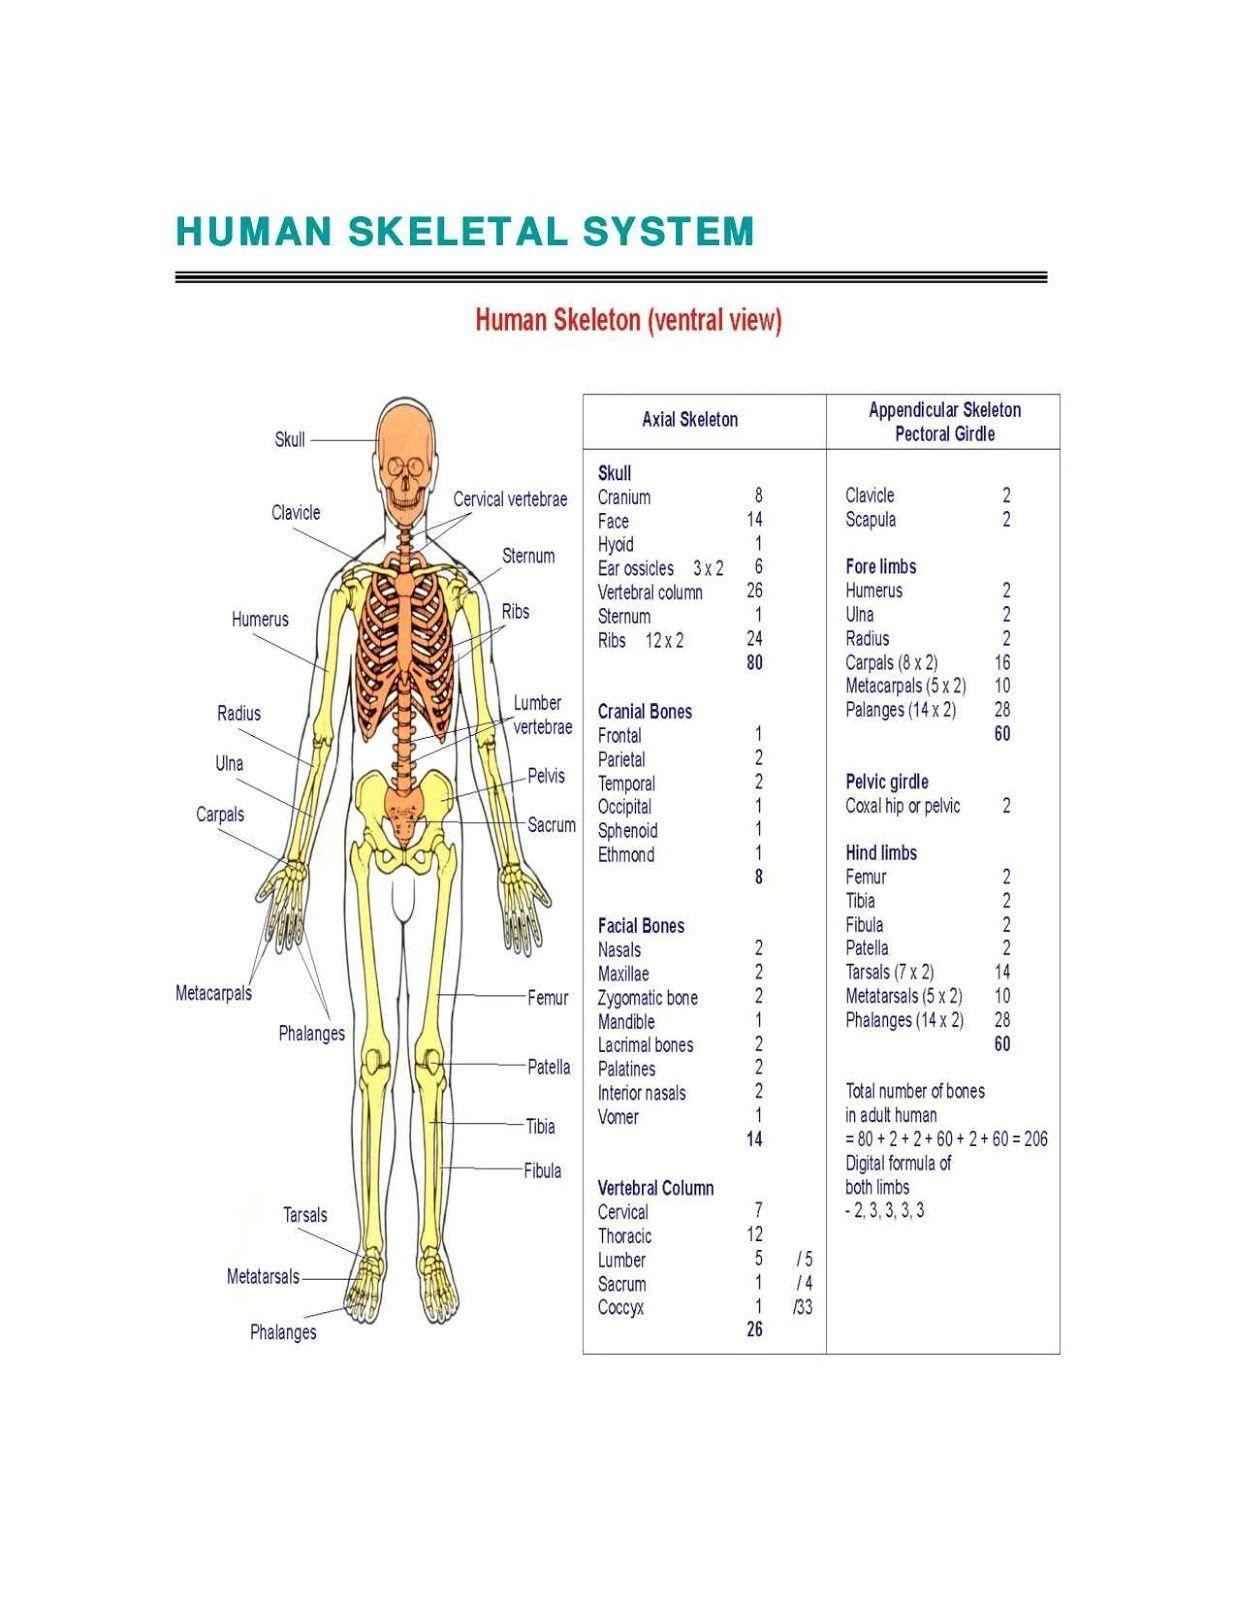 Appendicular Skeleton Worksheet Answers In